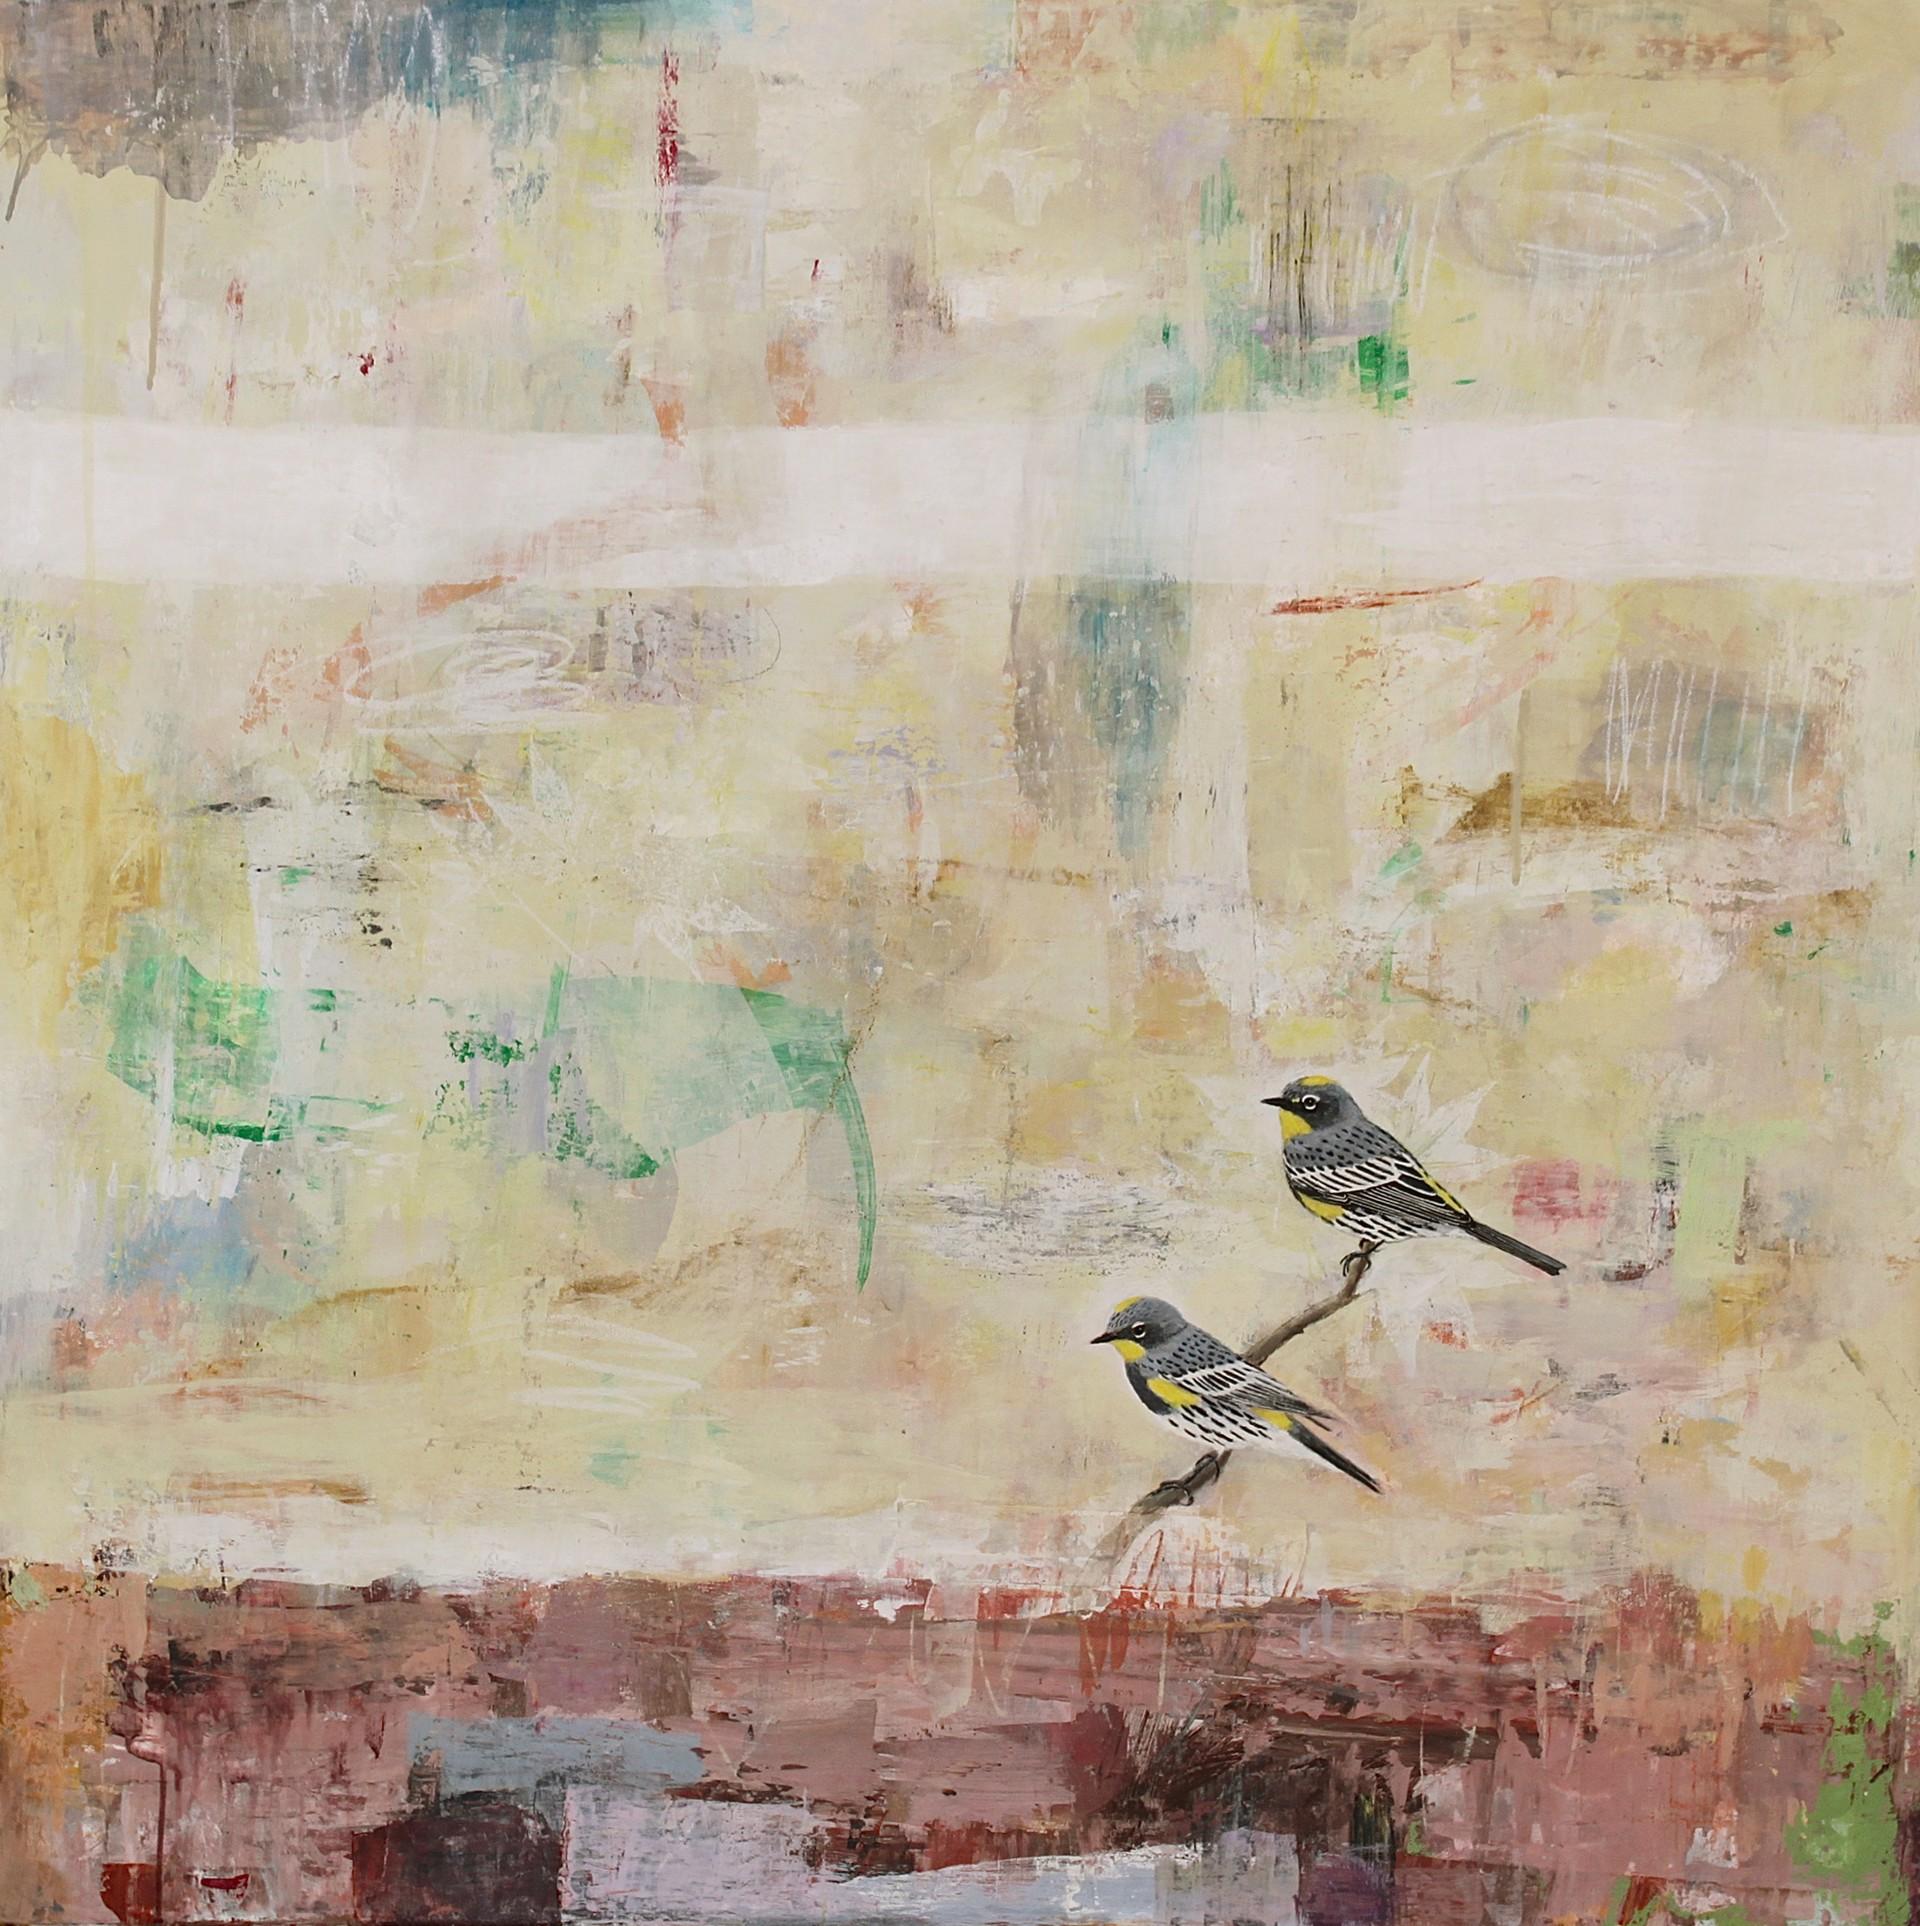 Outlook by Paul Brigham